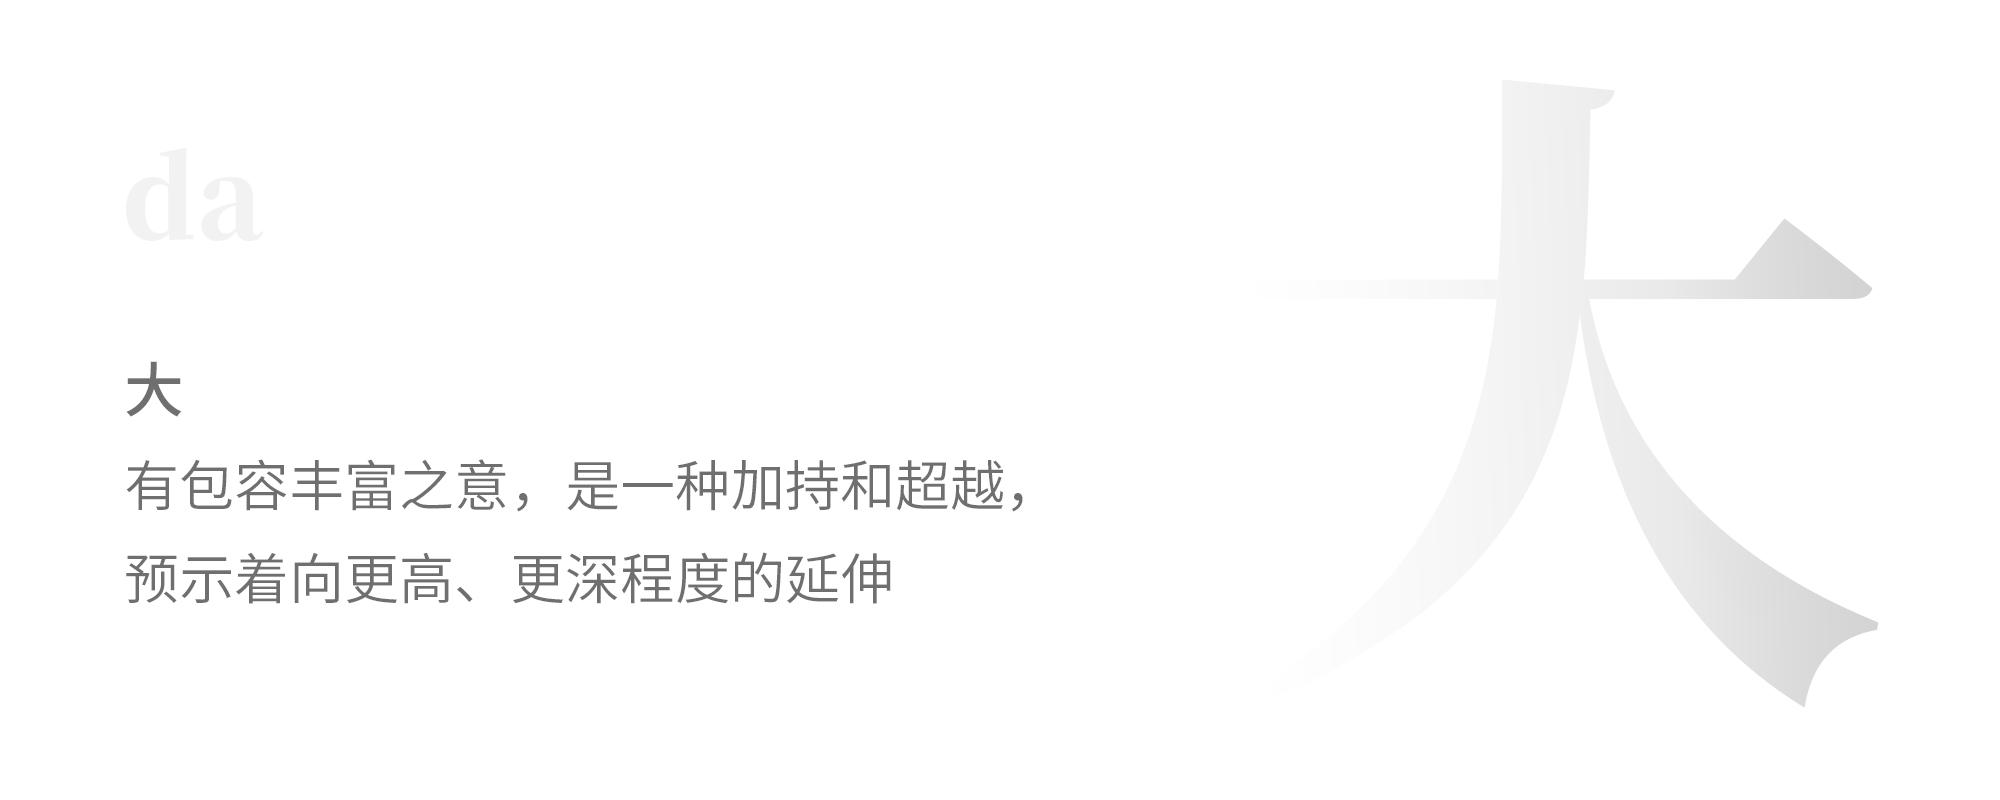 DESIO大铄设计:刚柔并济,经典优雅